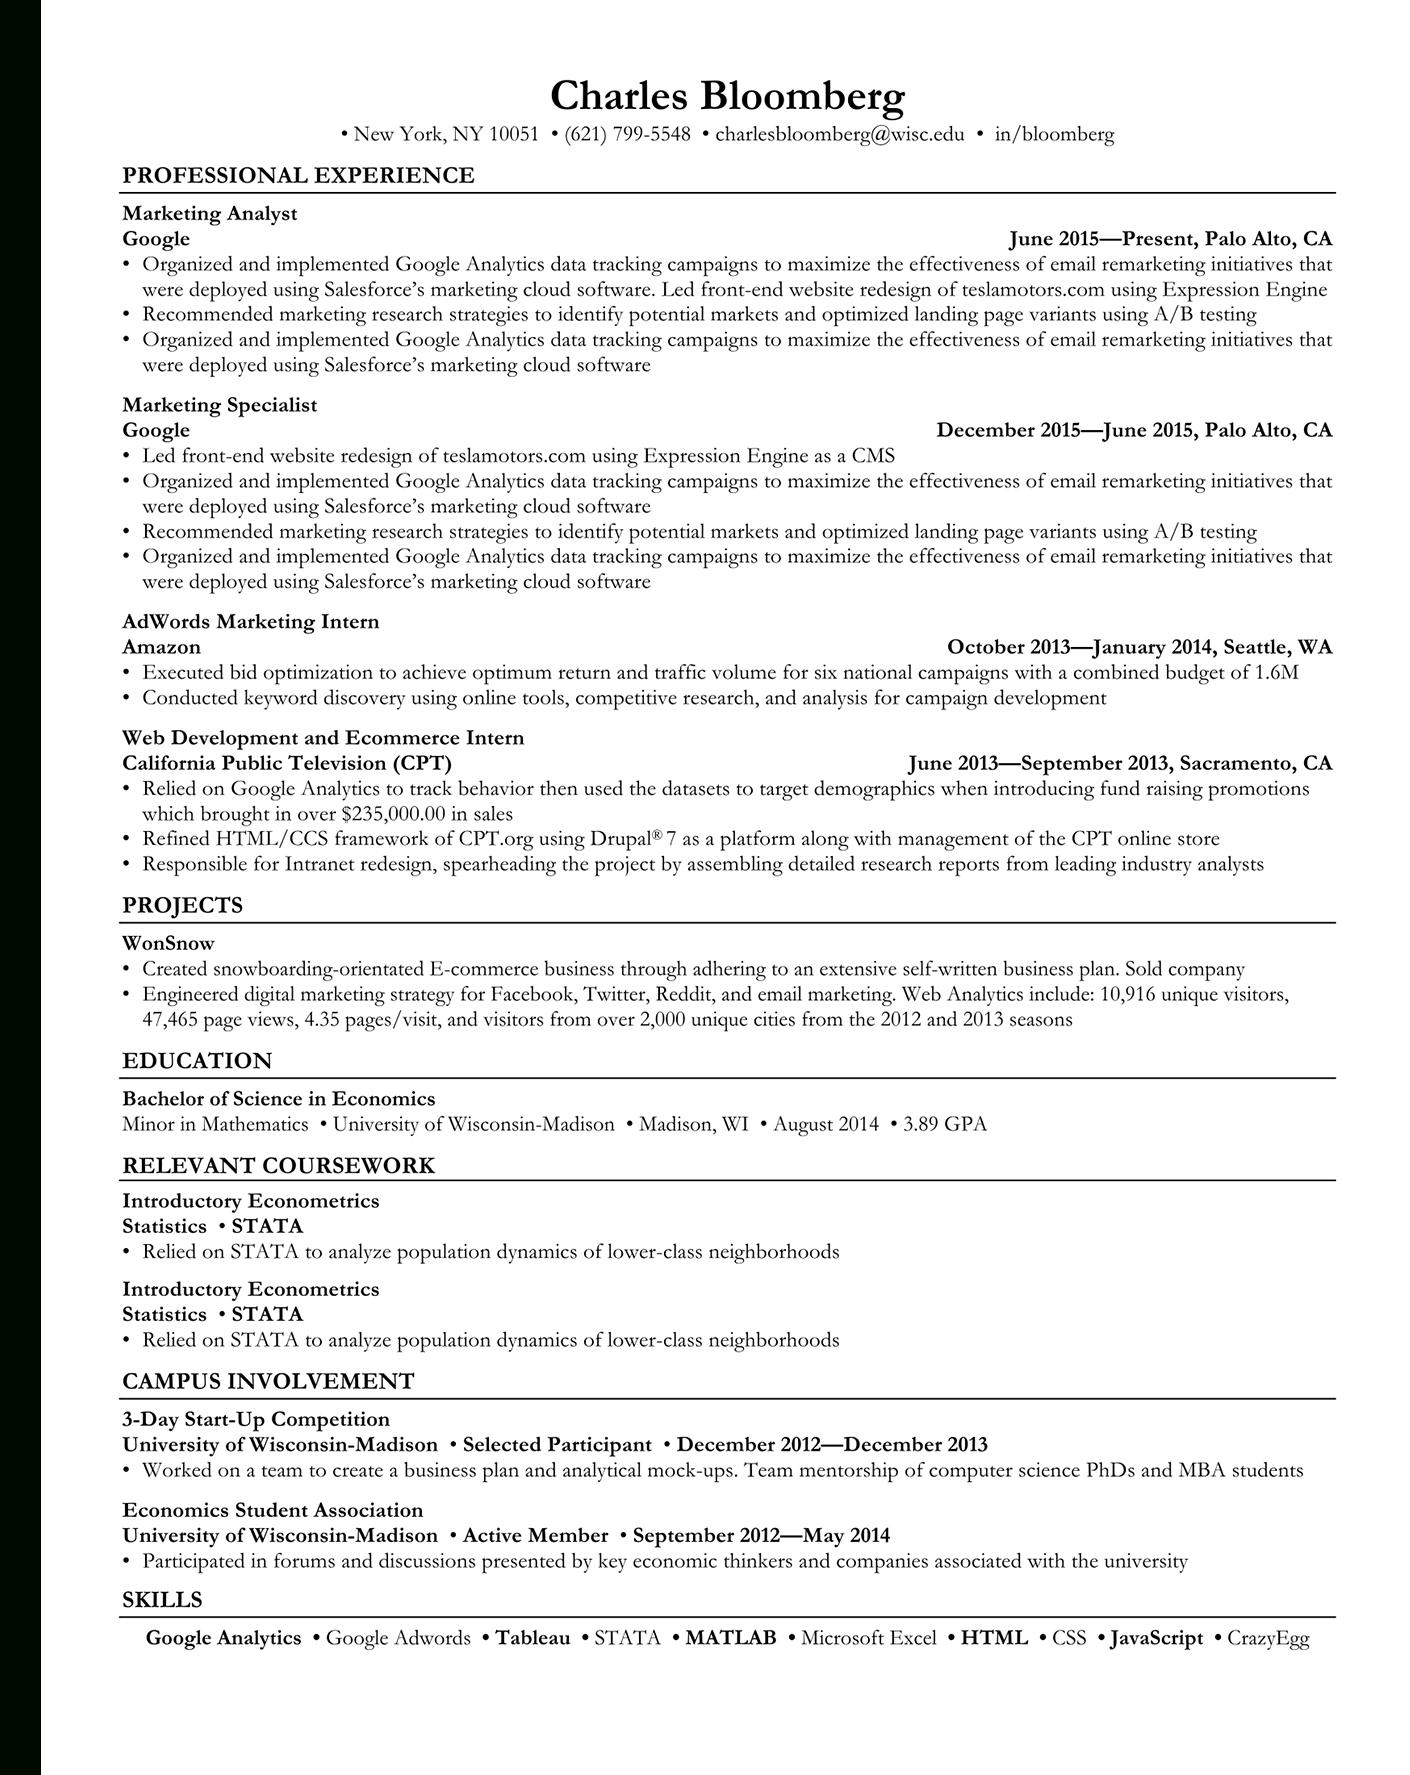 open to buy spreadsheet example for rezi ats optimized